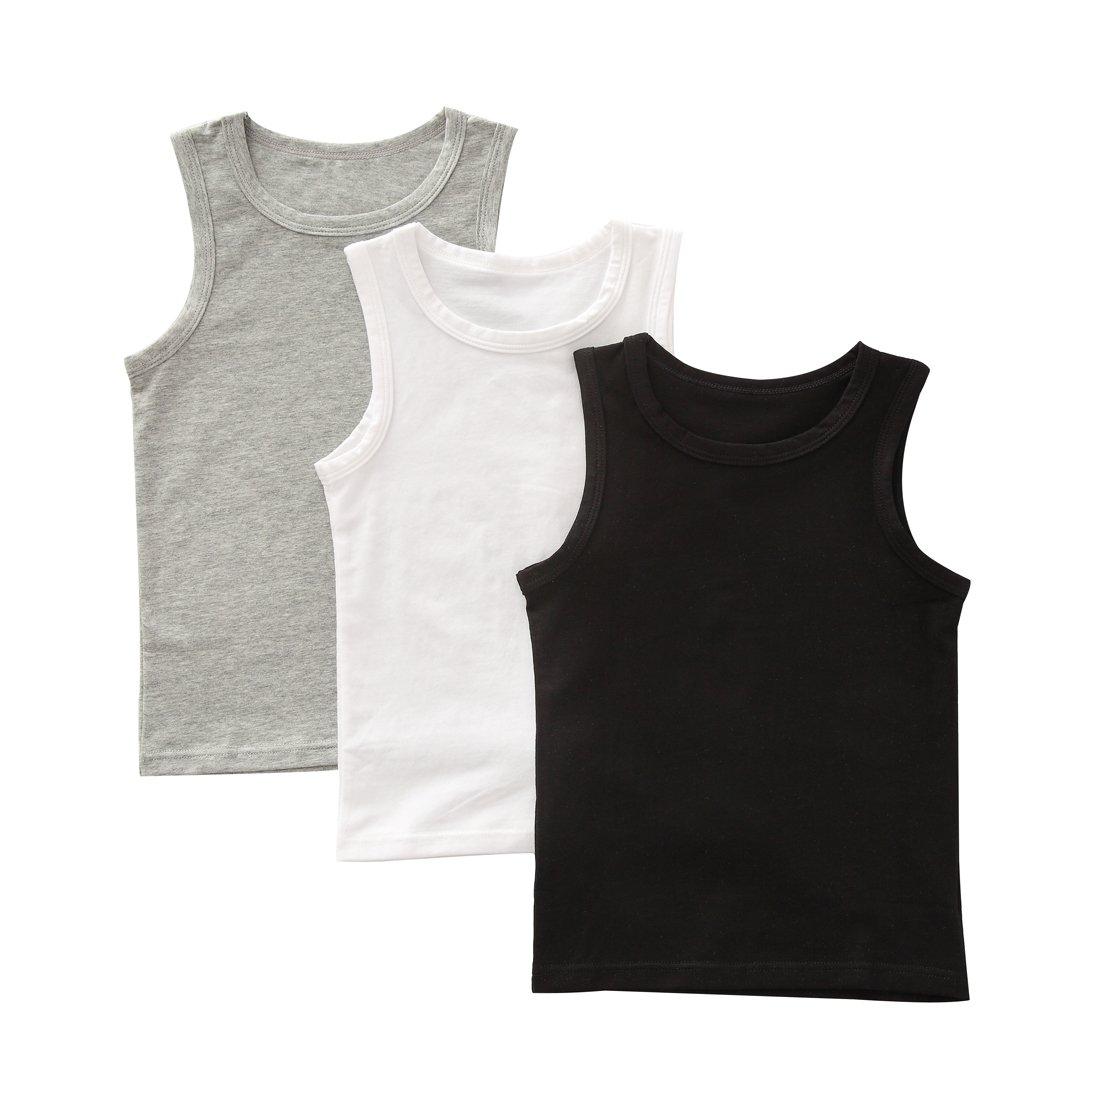 benetia Boys Girls Tank Undershirts 3-Pack